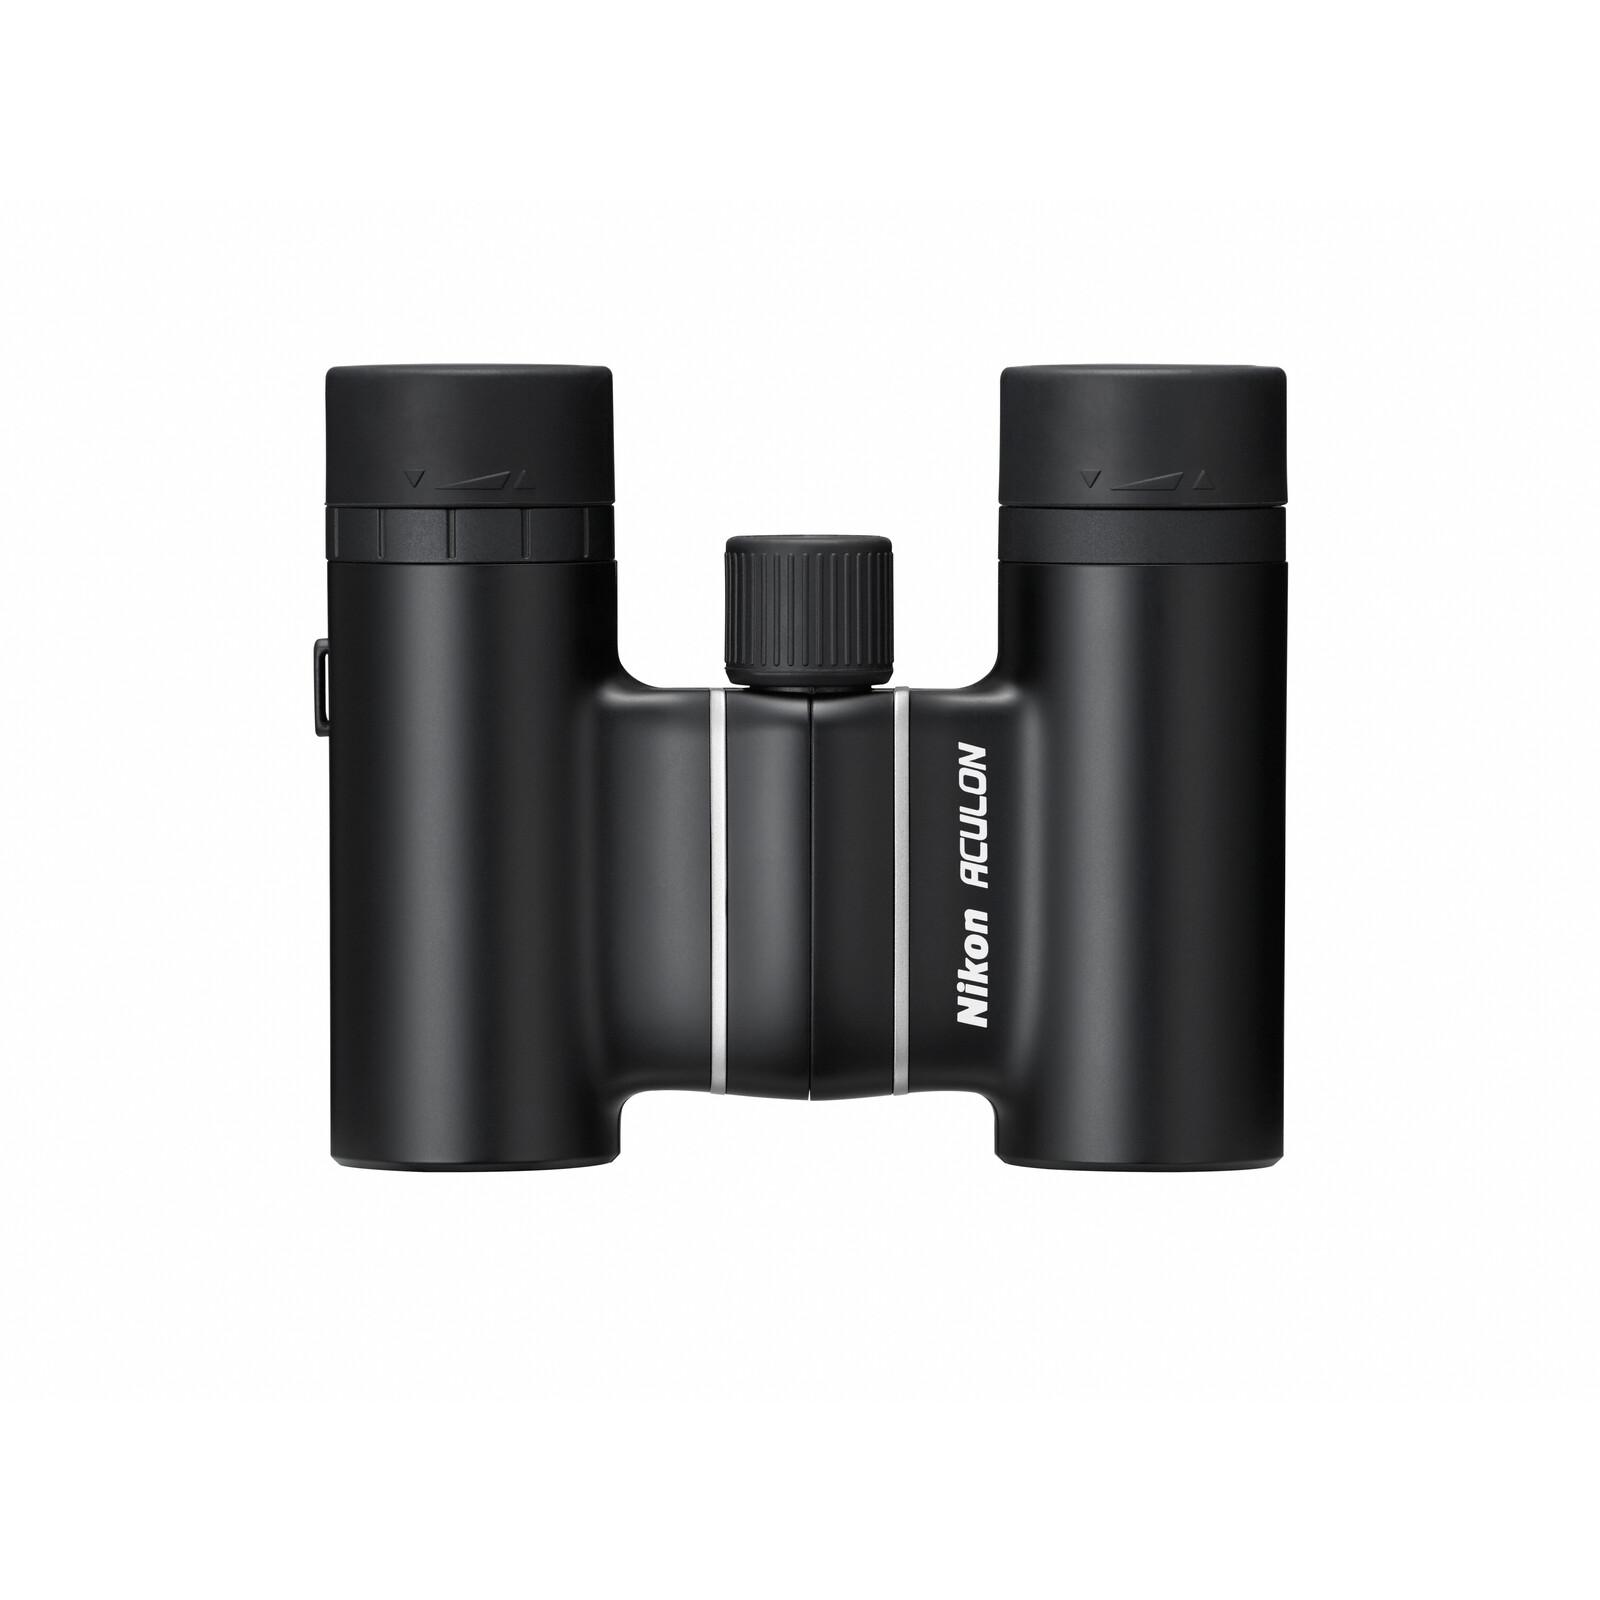 Nikon Aculon T02 10x21 Schwarz